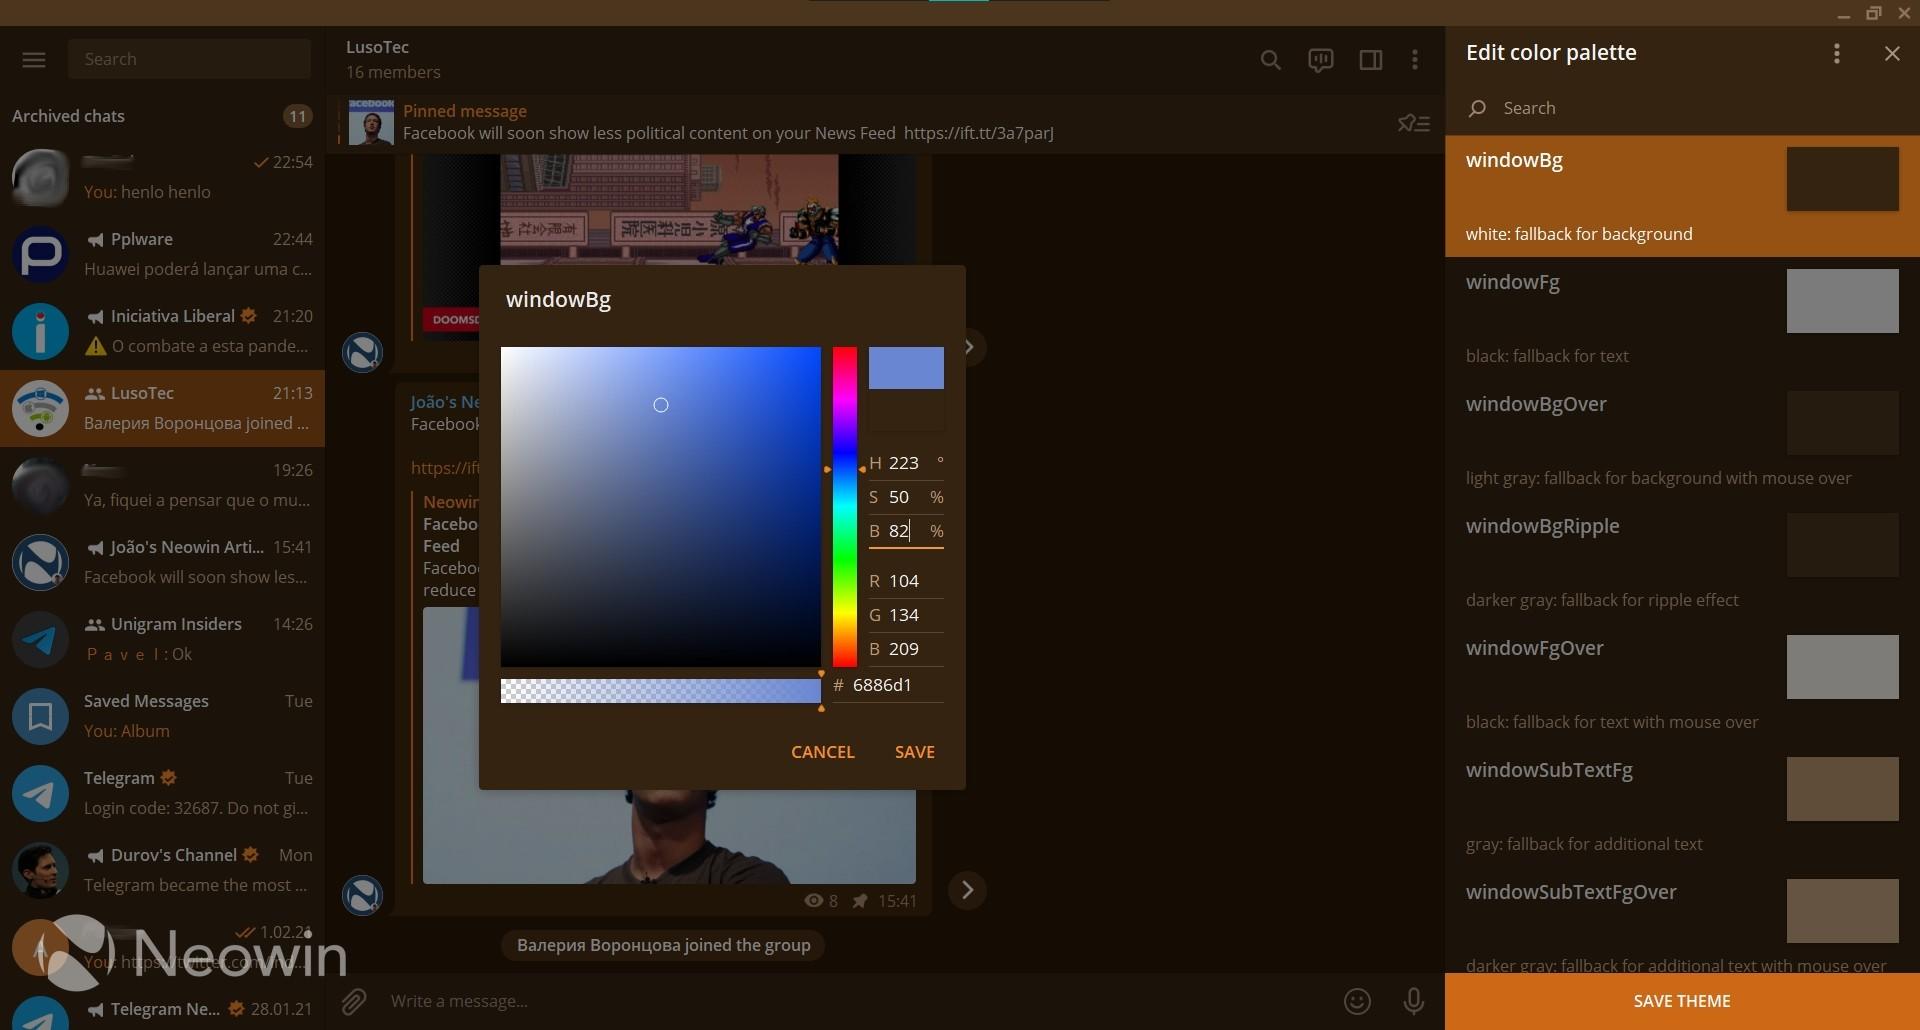 The color picker in Telegram Desktop's theme creator